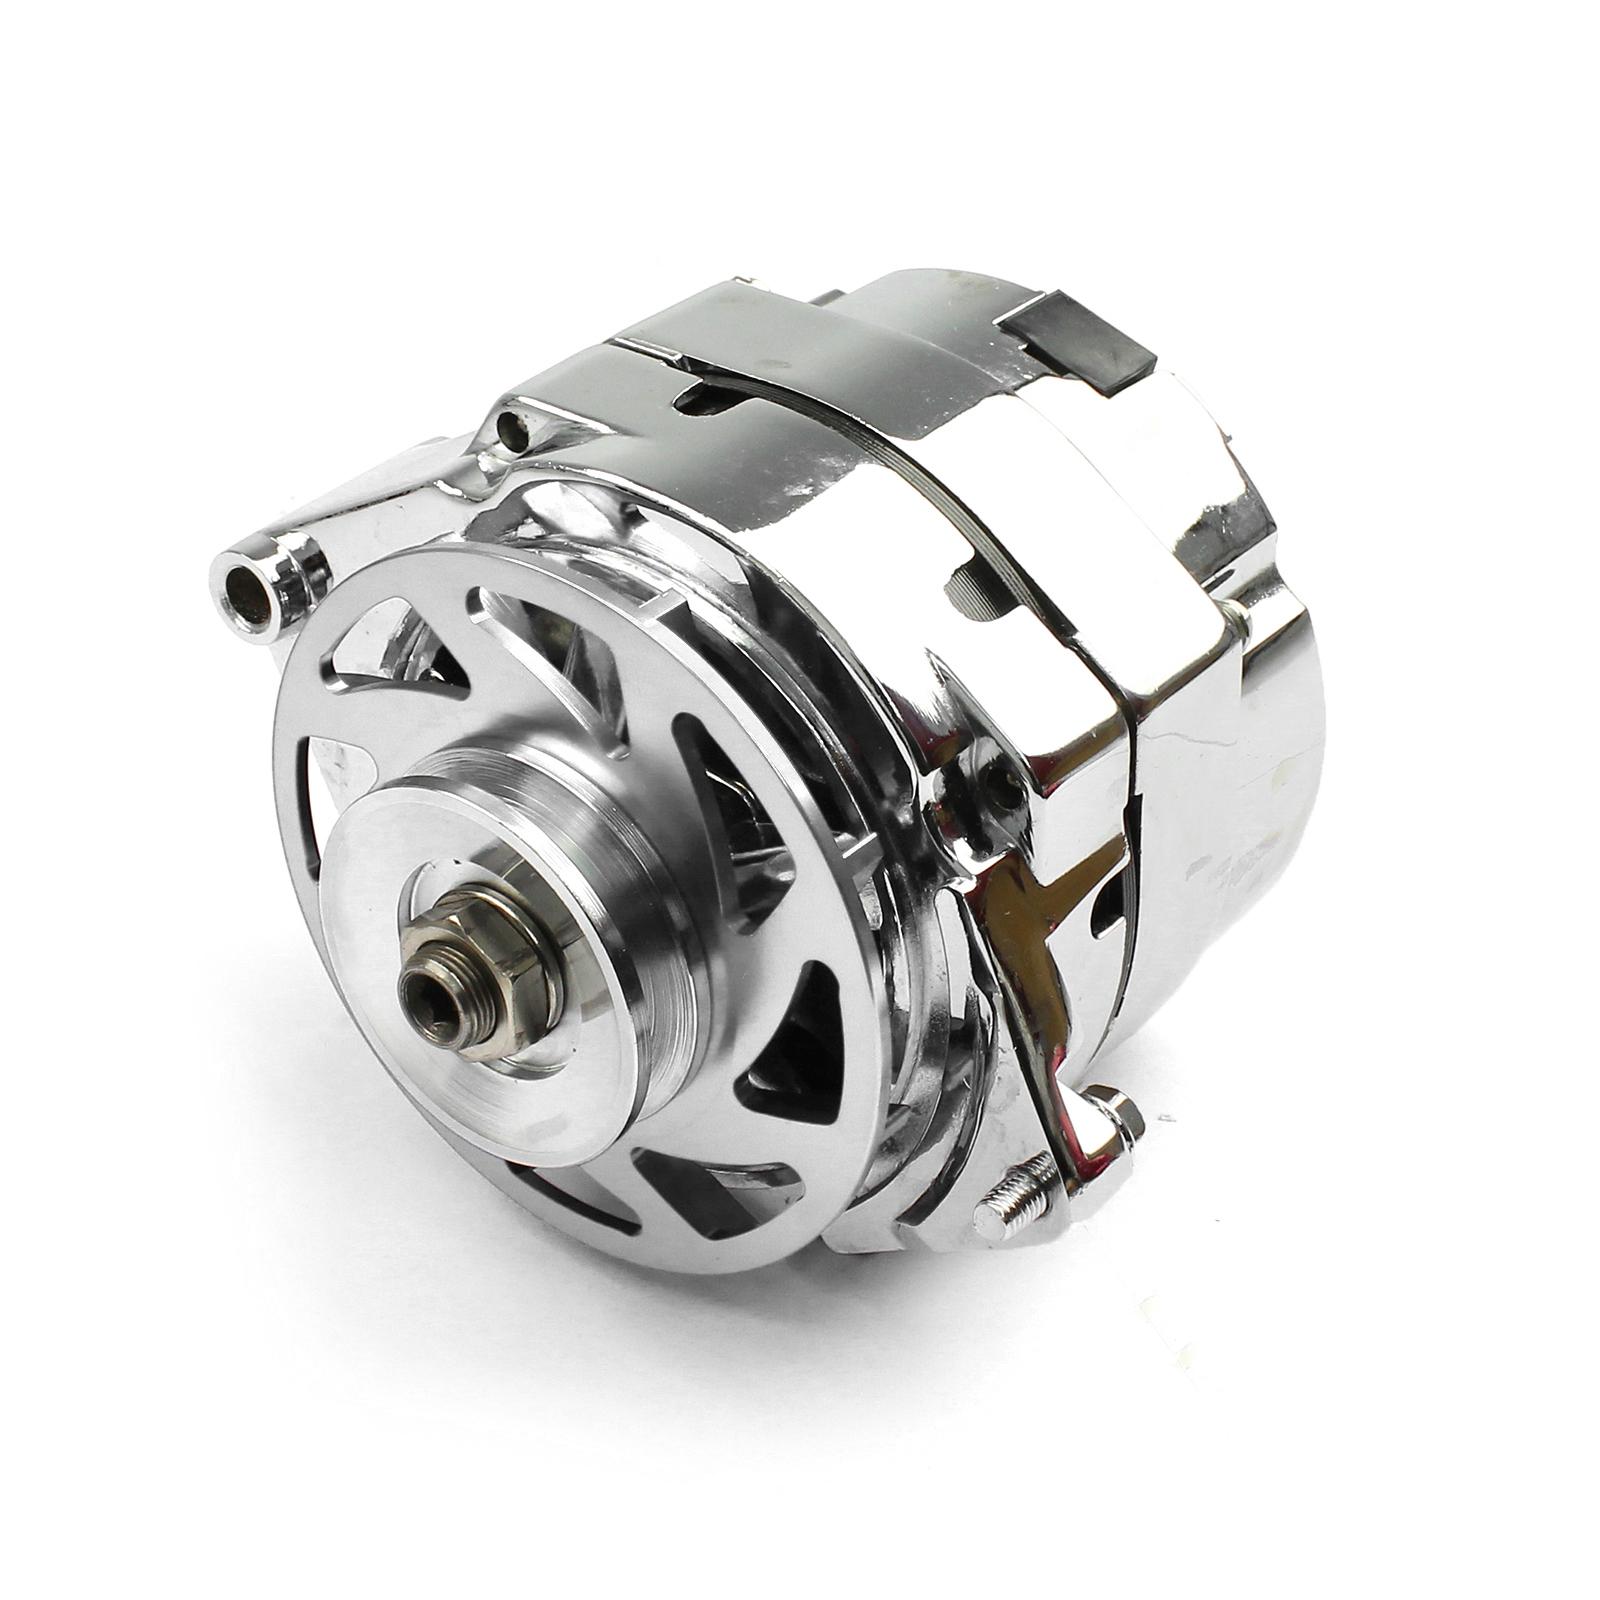 GM 100 Amp 1 Wire Internal Regulator High Output Alternator w/ Billet Fan Silver